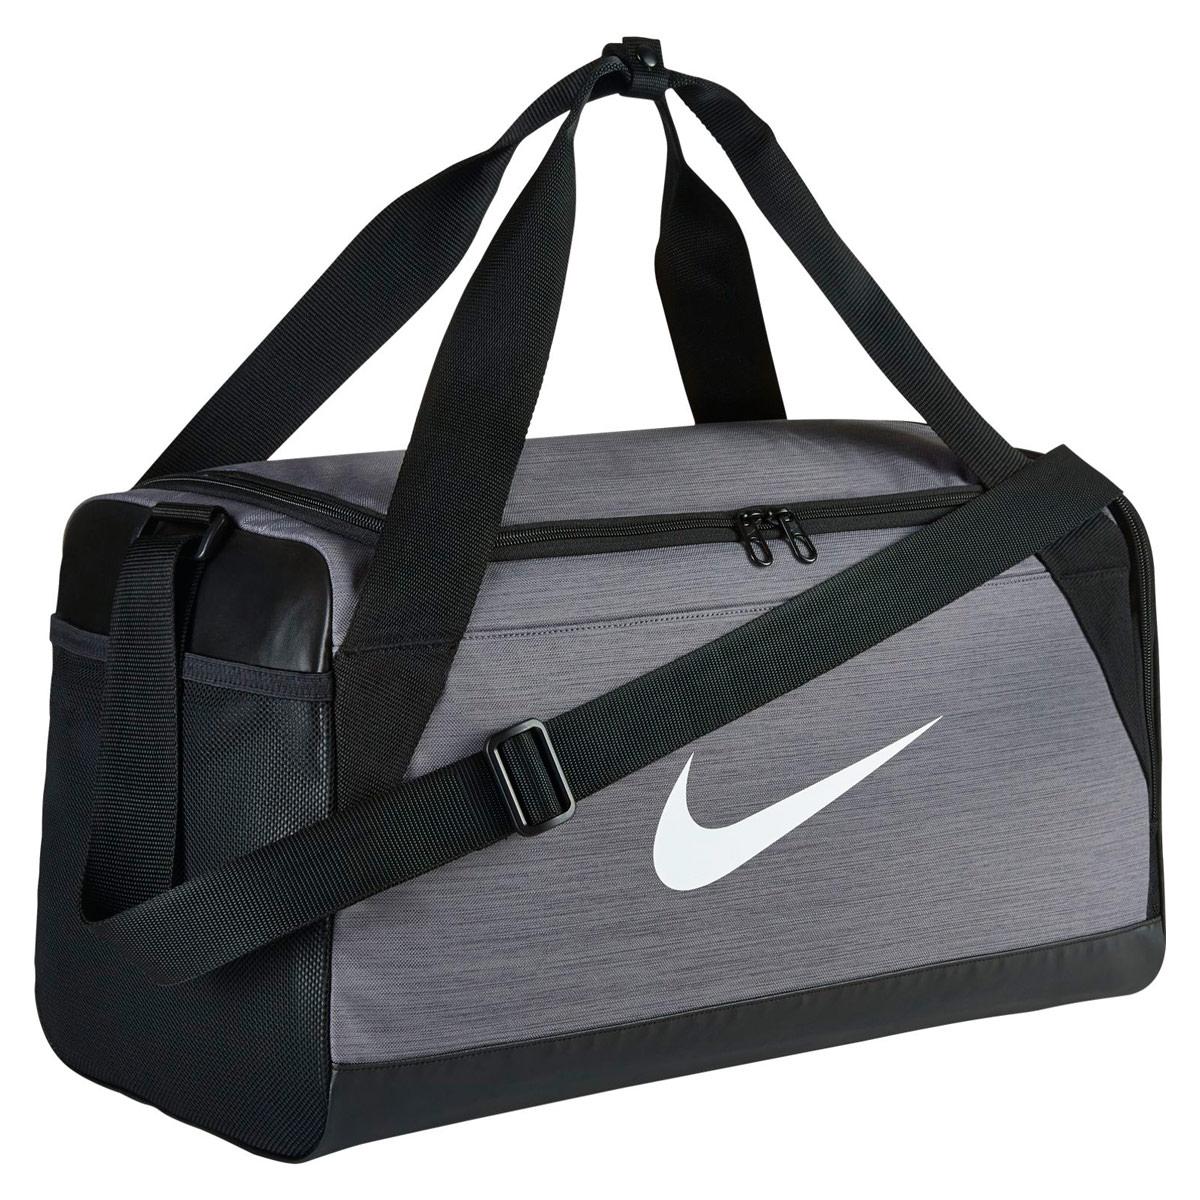 Nike Brasilia Small Training Duffel Bag - Sports bags for Men - Grey ... 4811f42e3e0f0